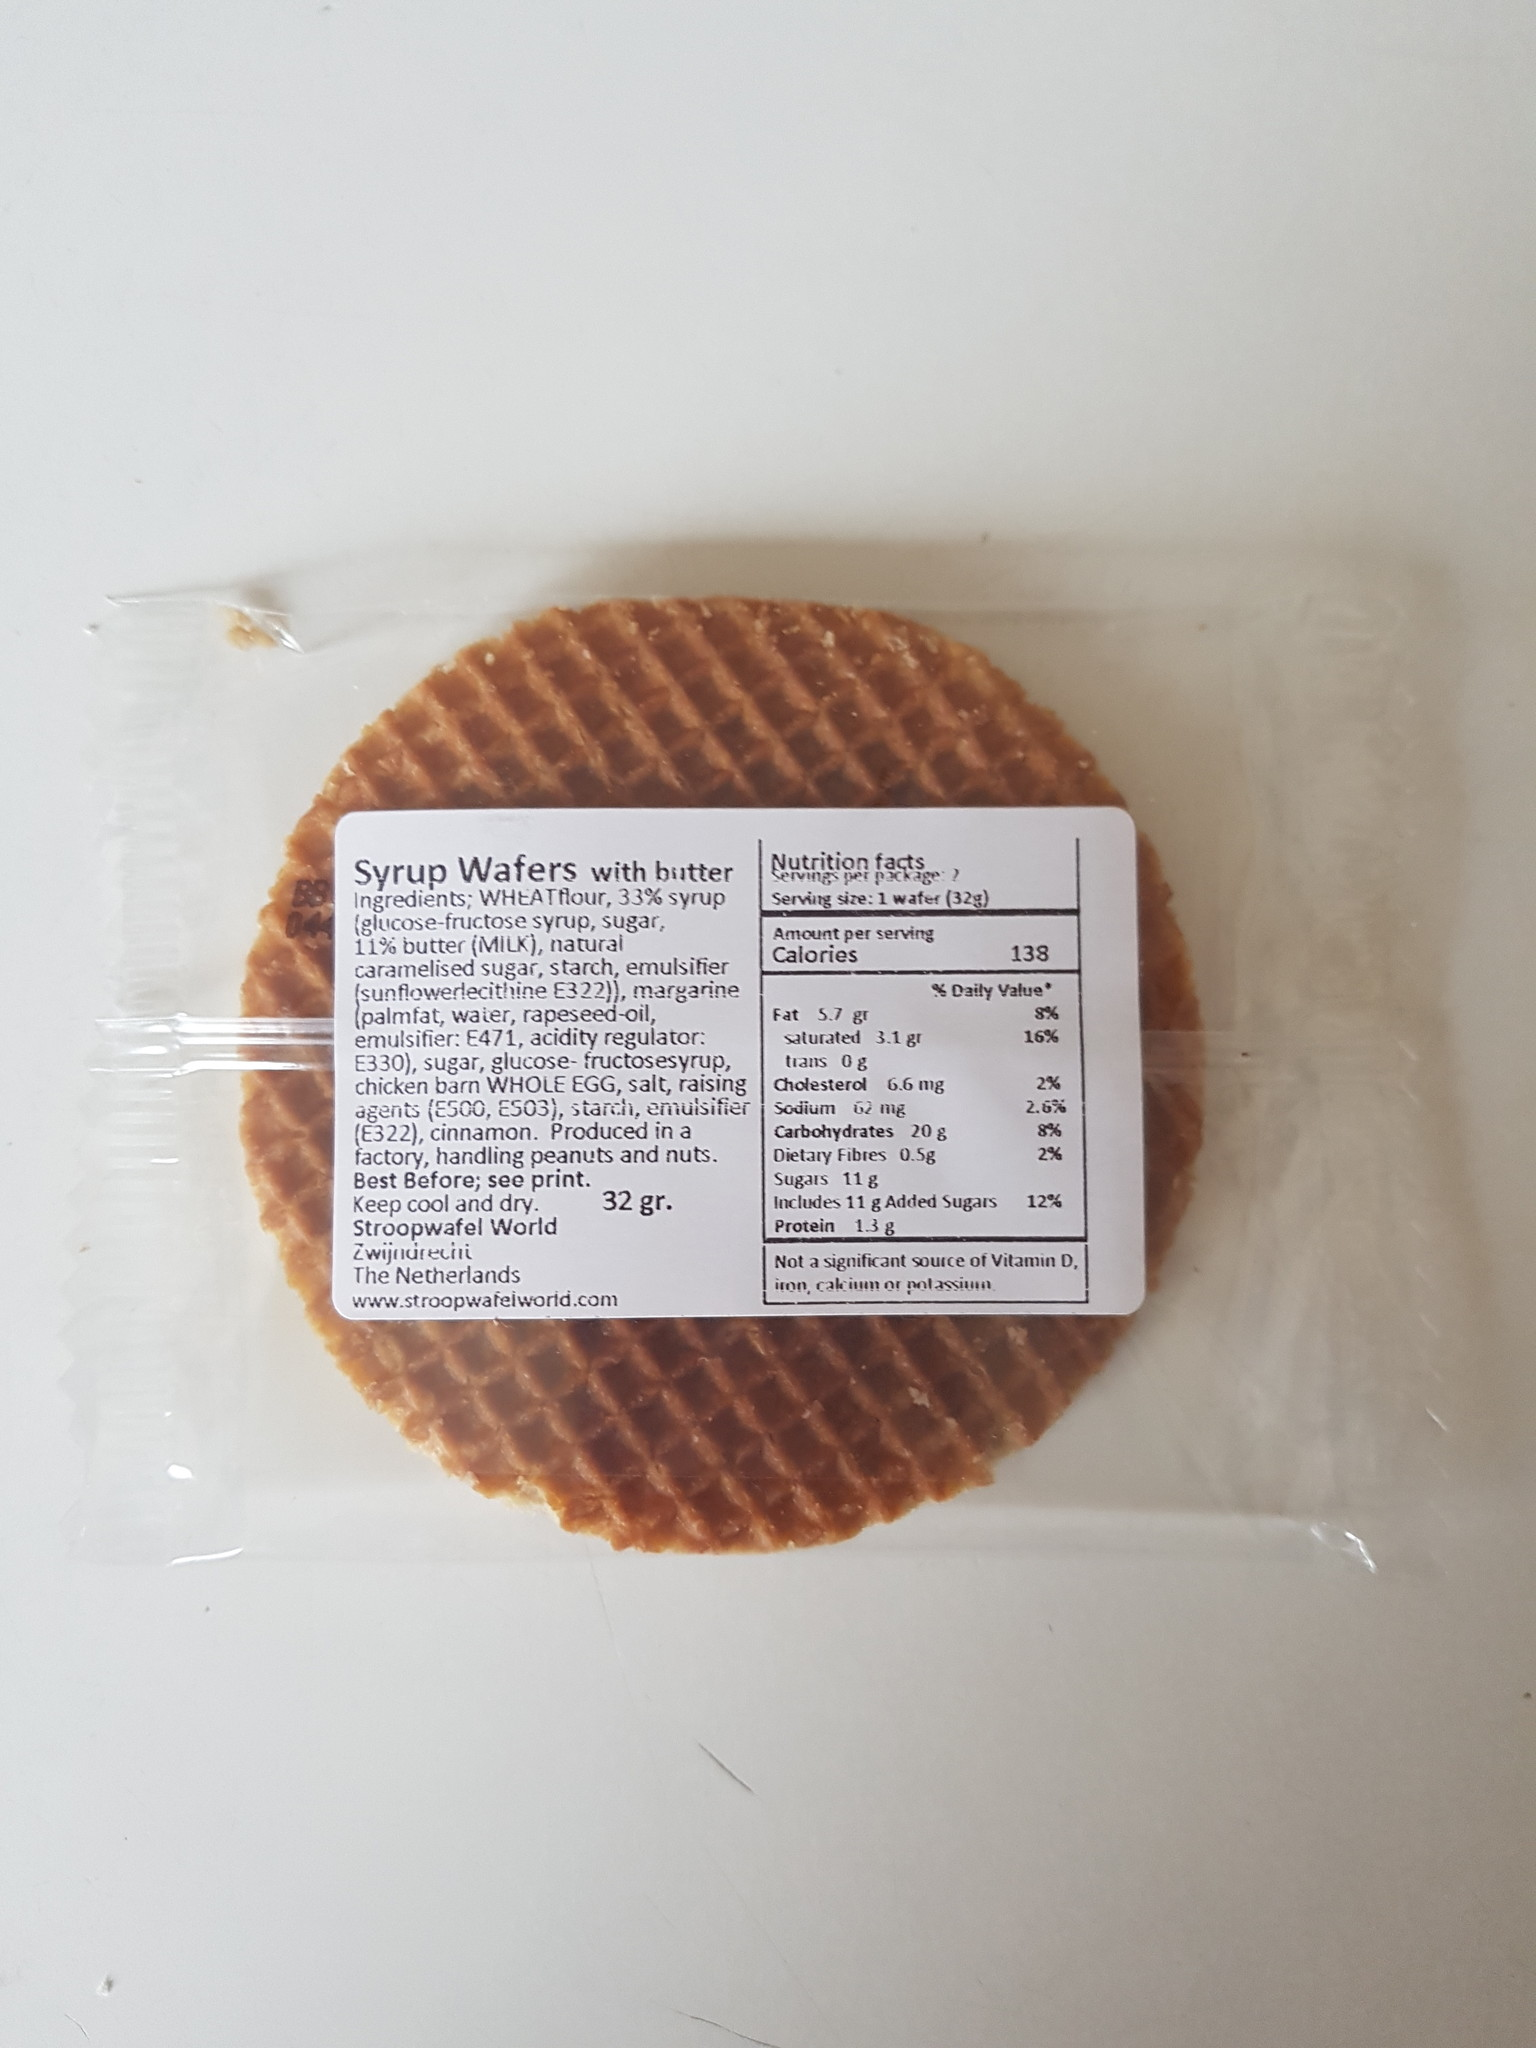 Stroopwafel World - los verpakte stroopwafel